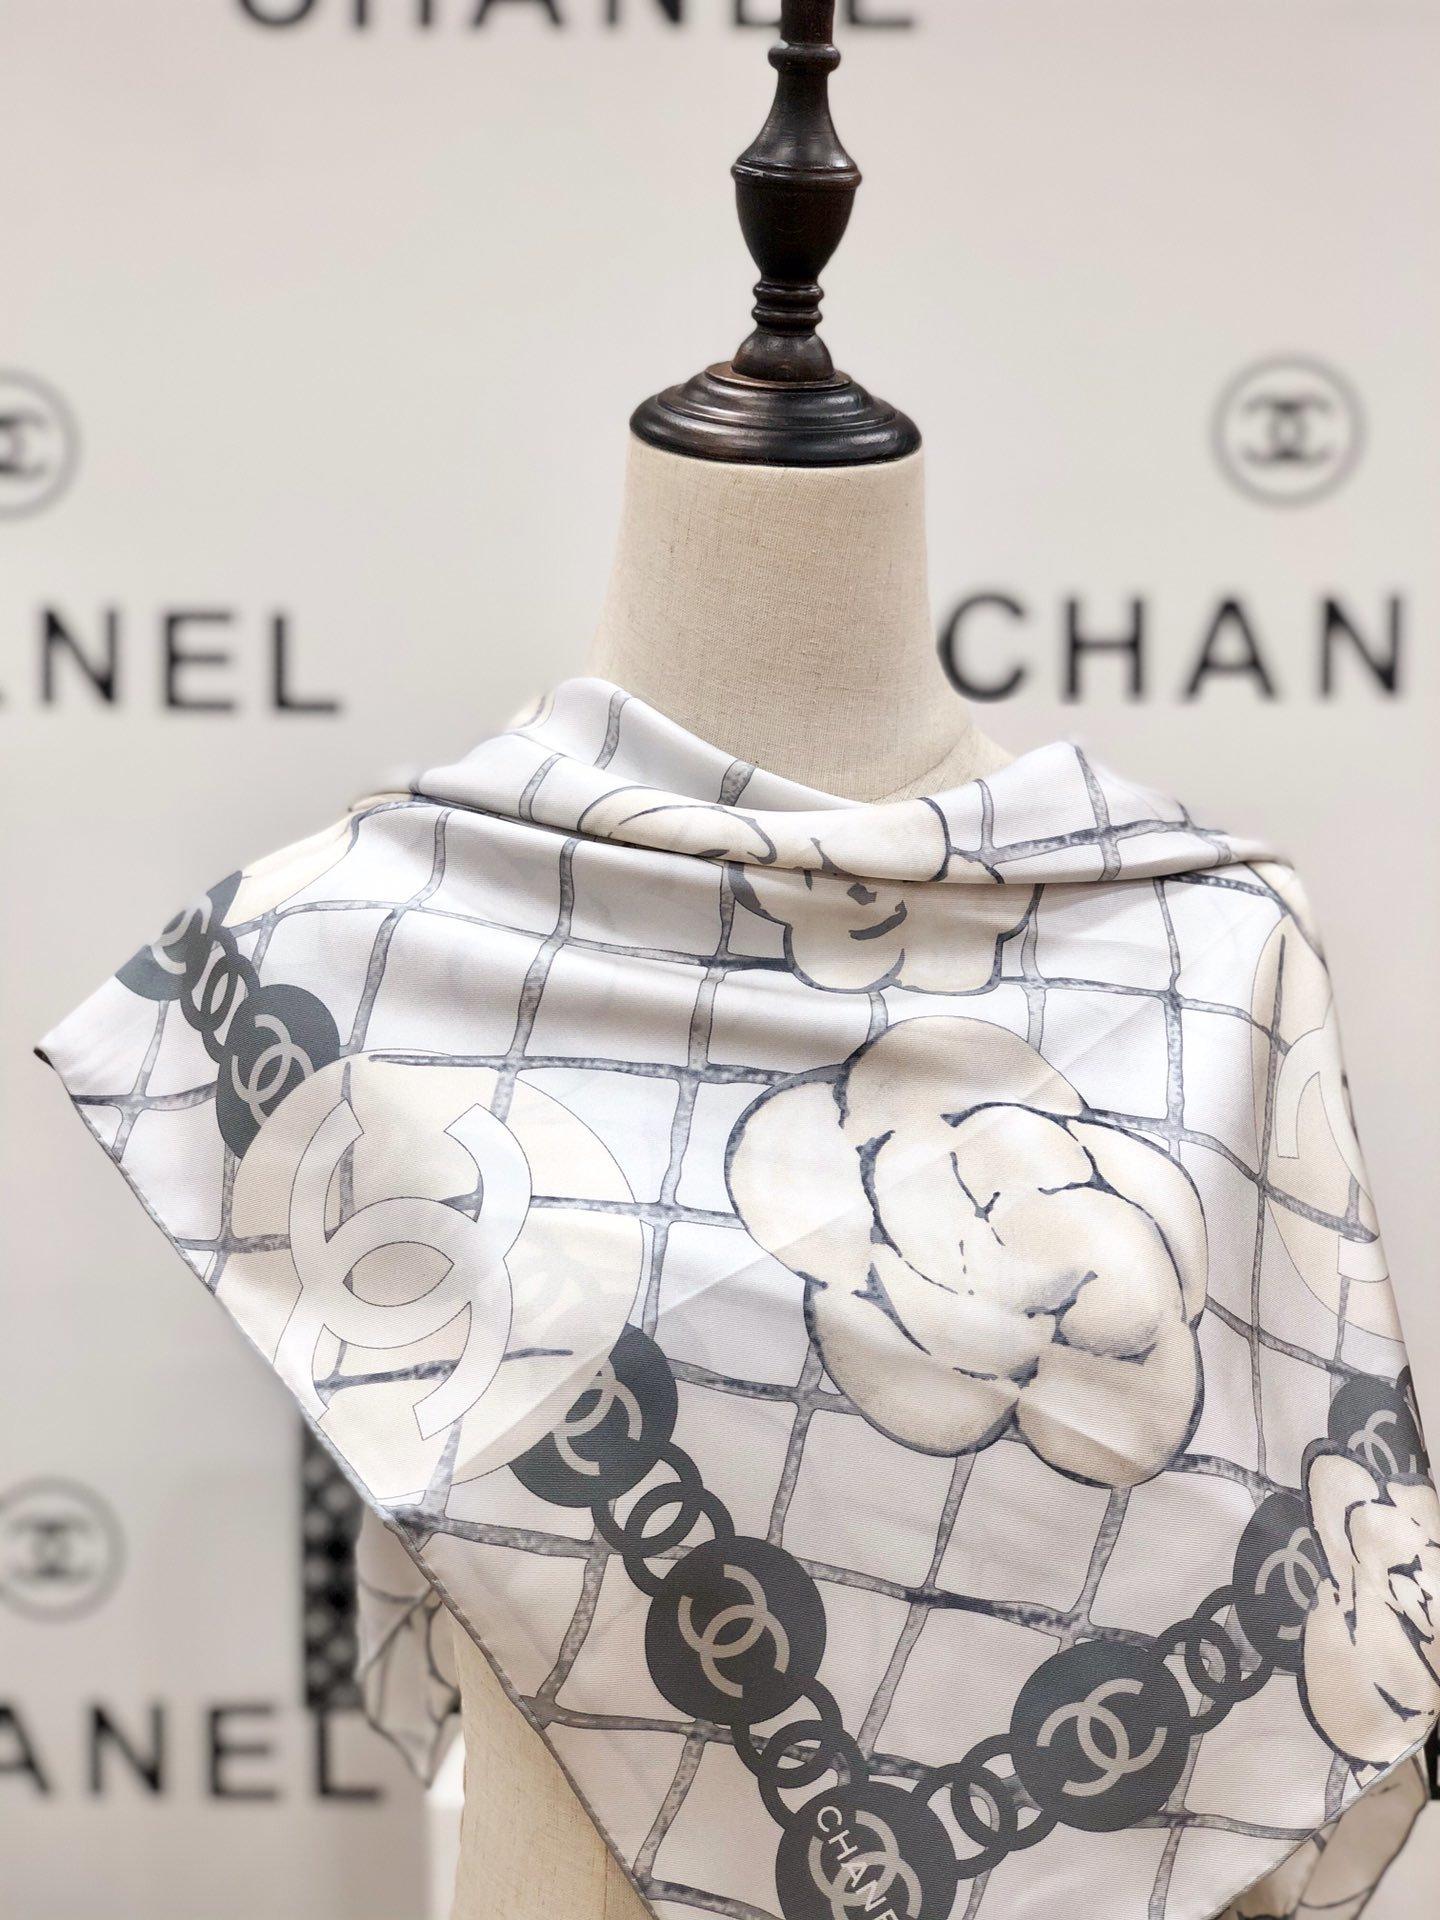 Chanel香奈儿山茶花方巾明星热门同款(图7)